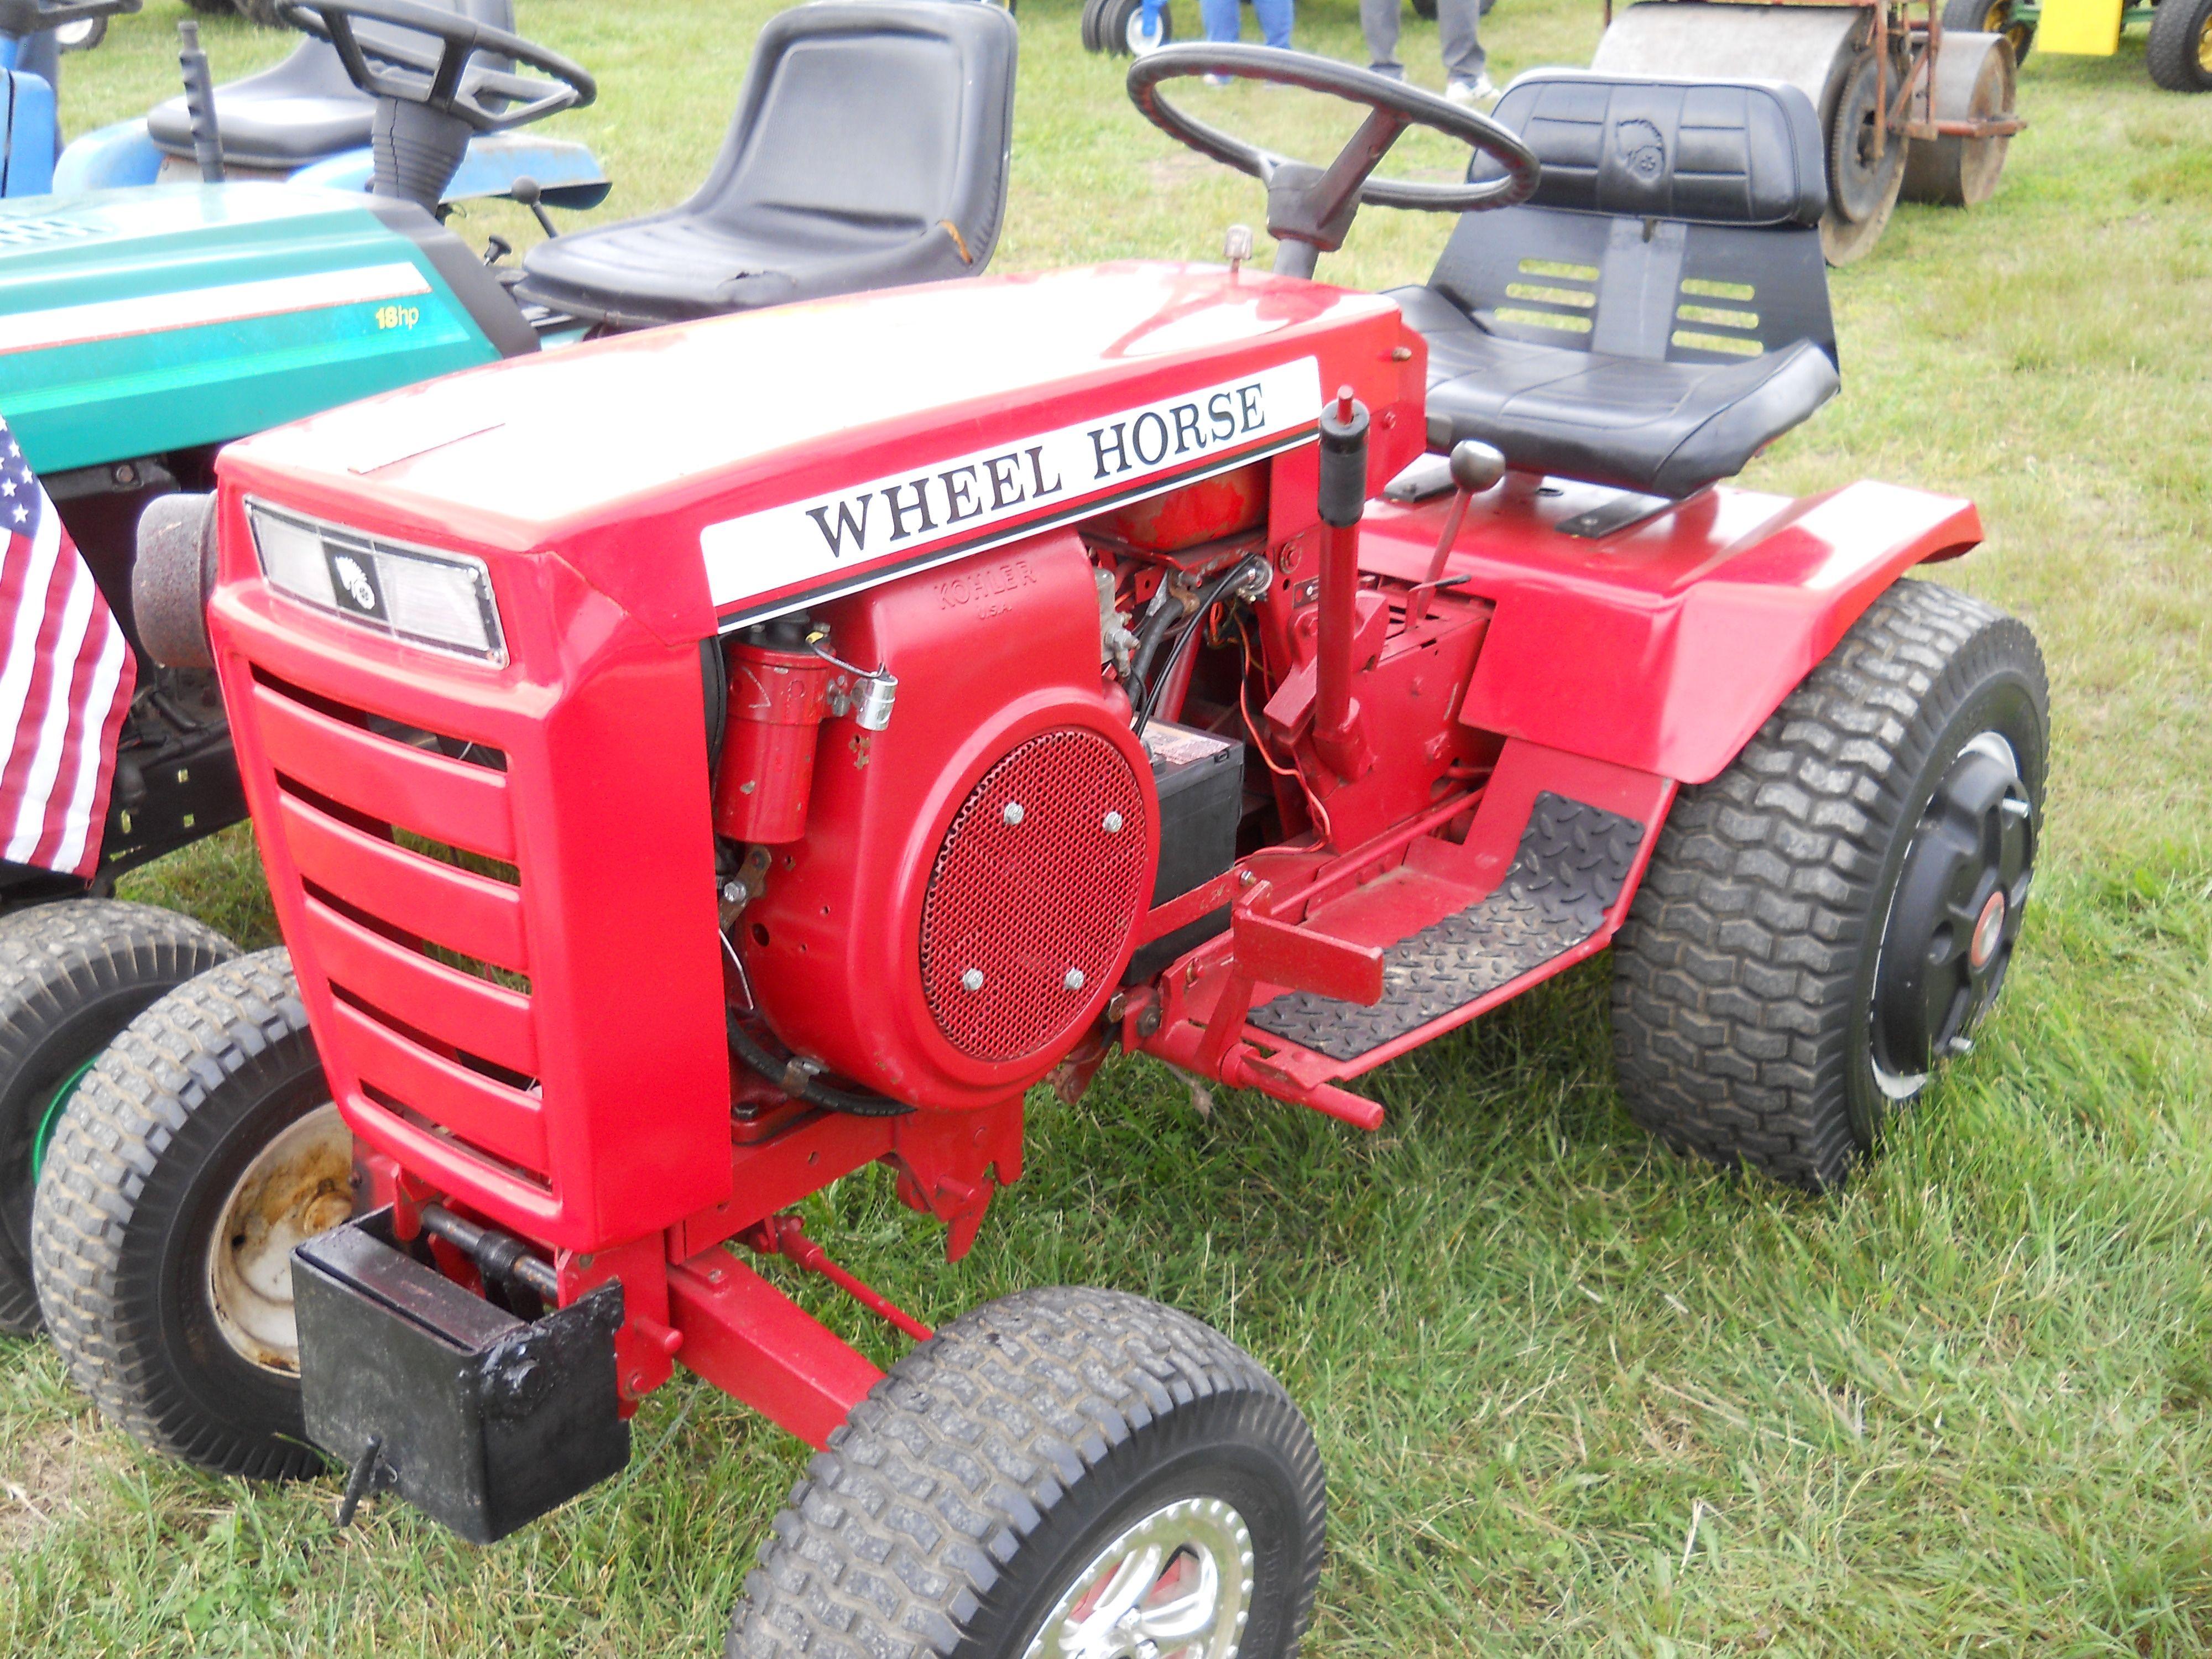 Mini Wheel Horse Tractor : Little wheel horse tractor https youtube user